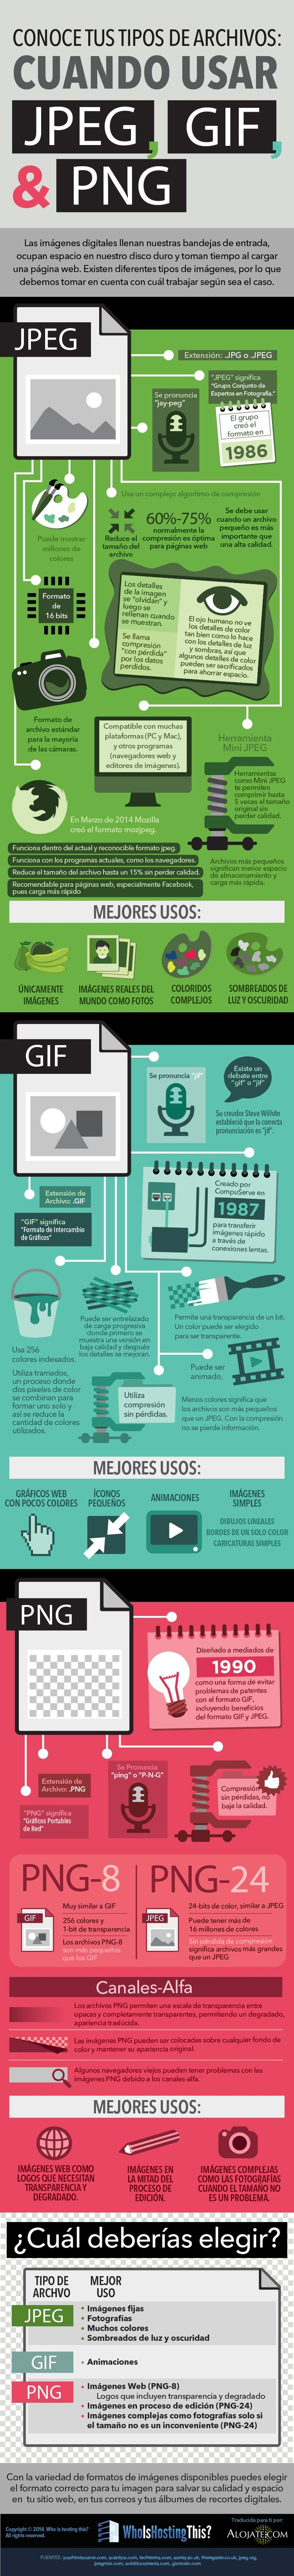 Cuándo usar Jpeg o Png o Gif #infografia #infographic #design vía @Alojate